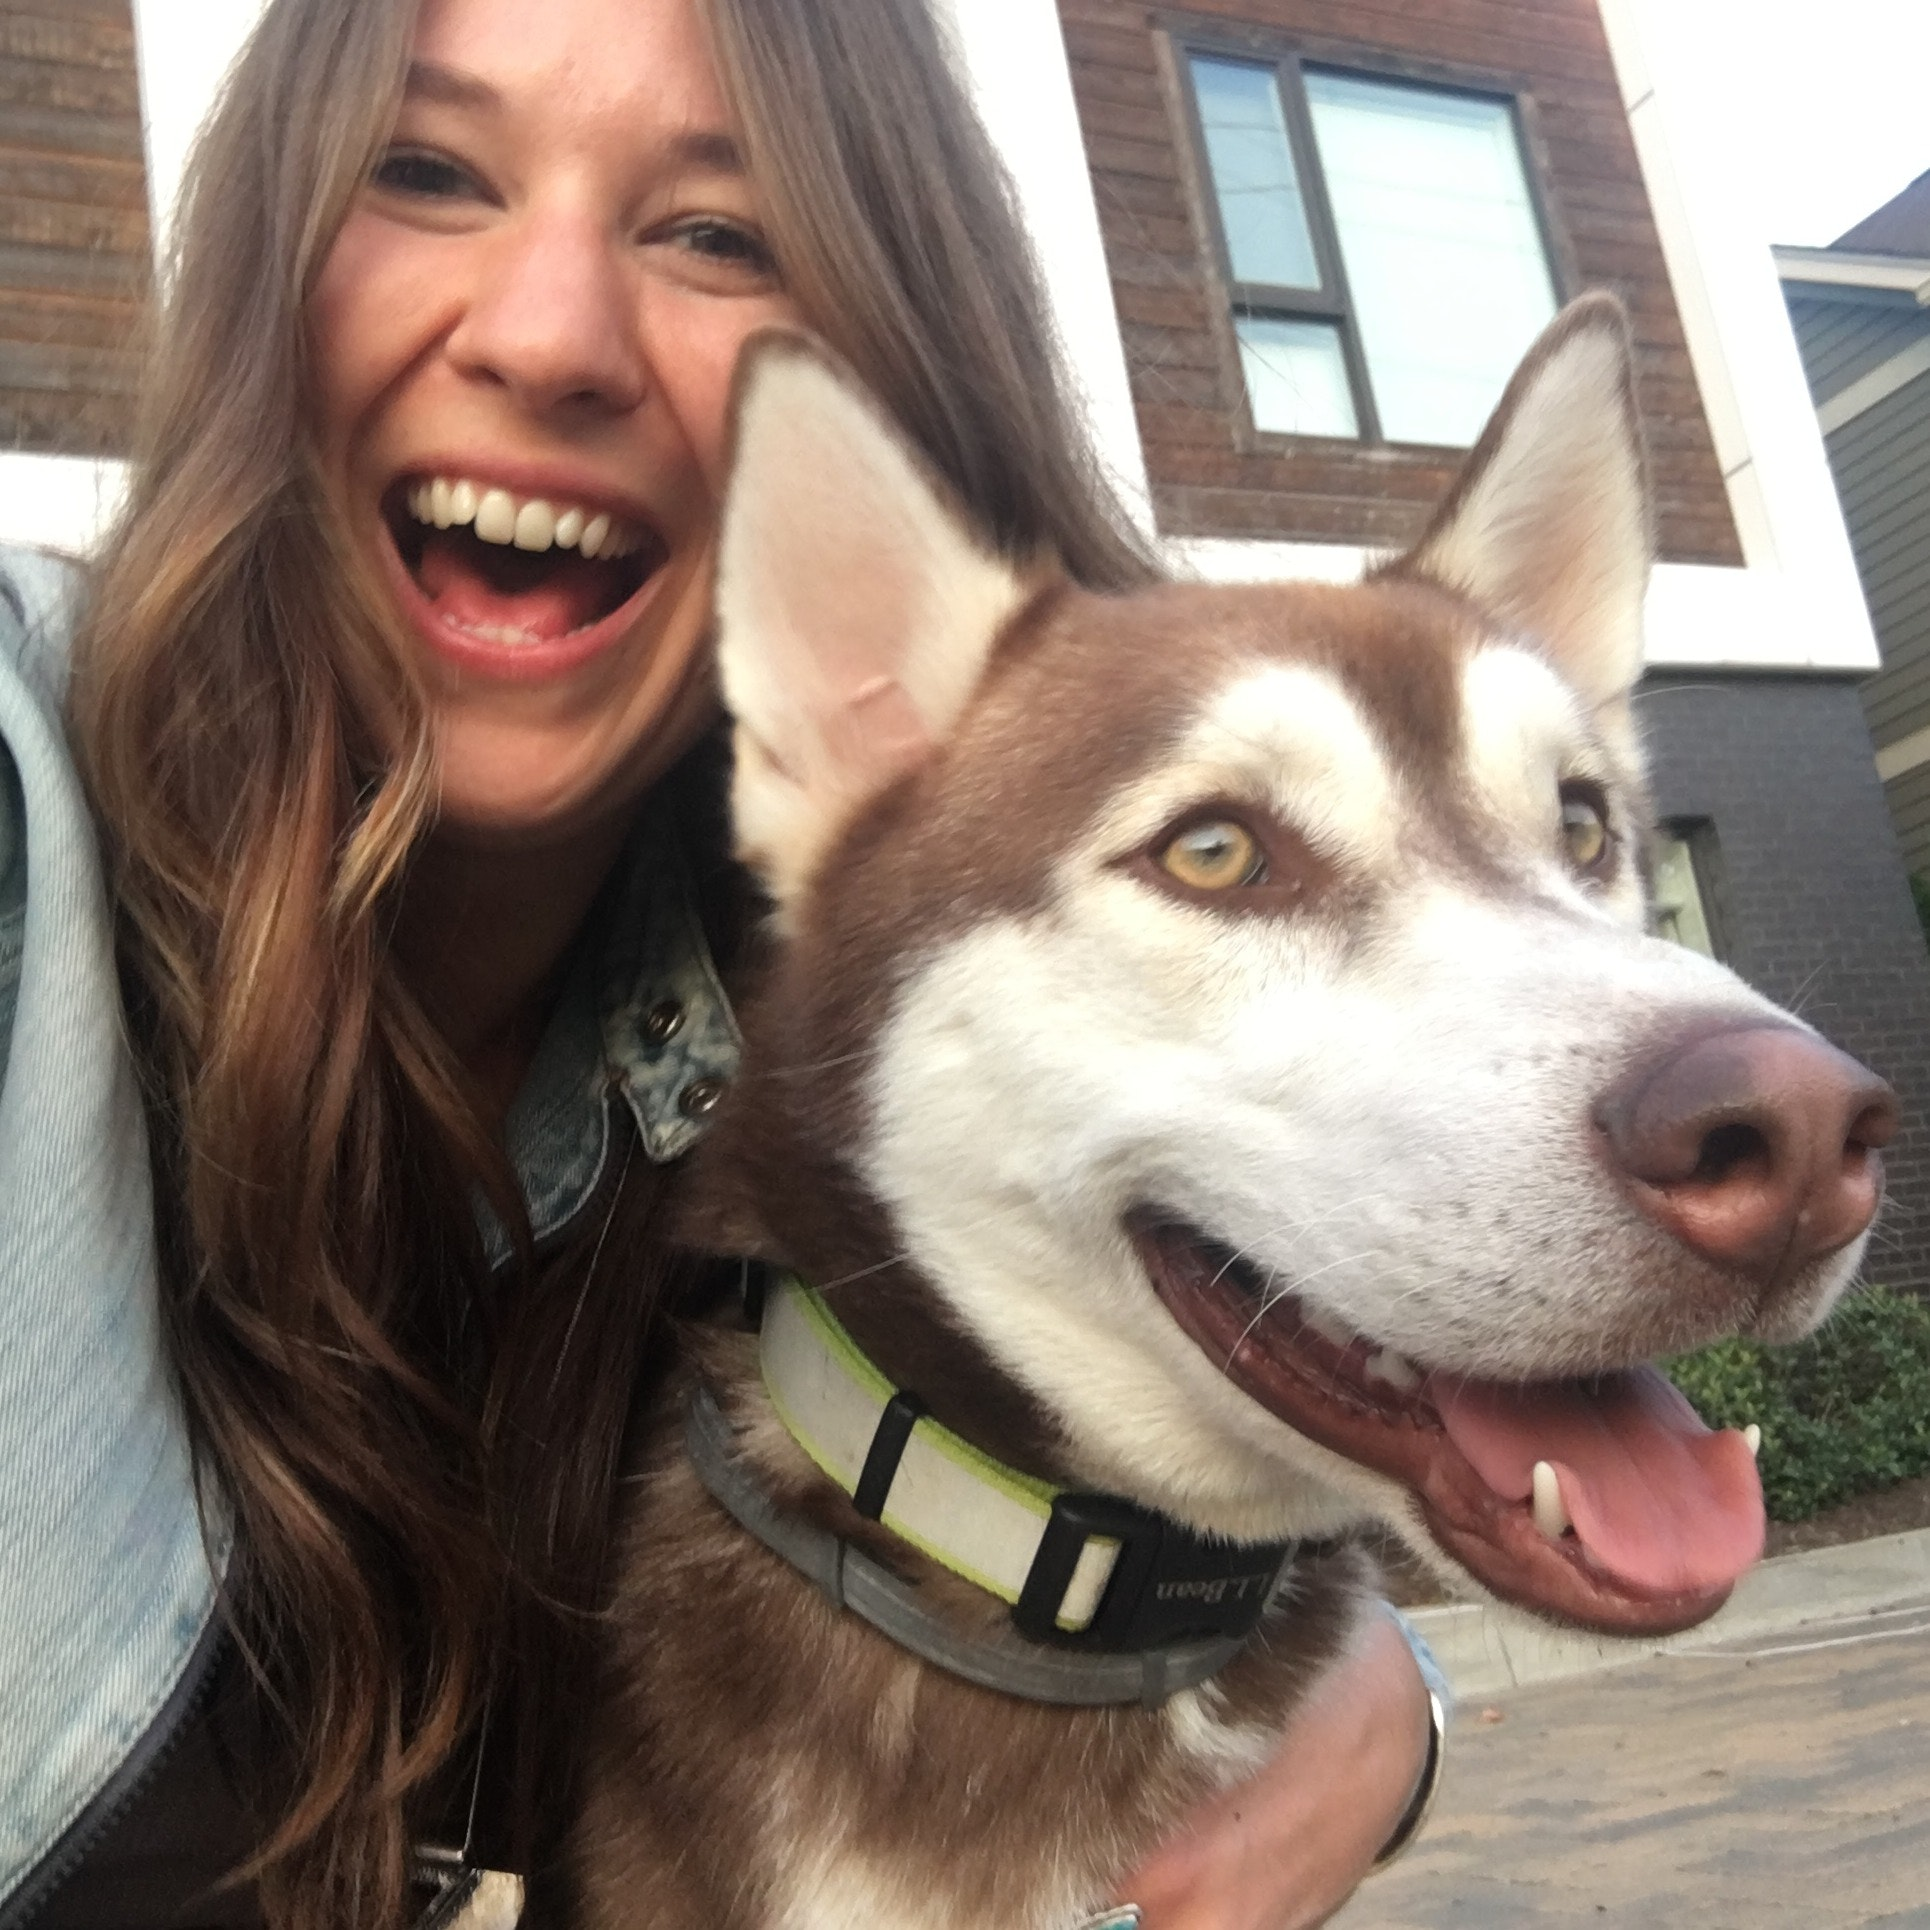 RaShelle's dog day care